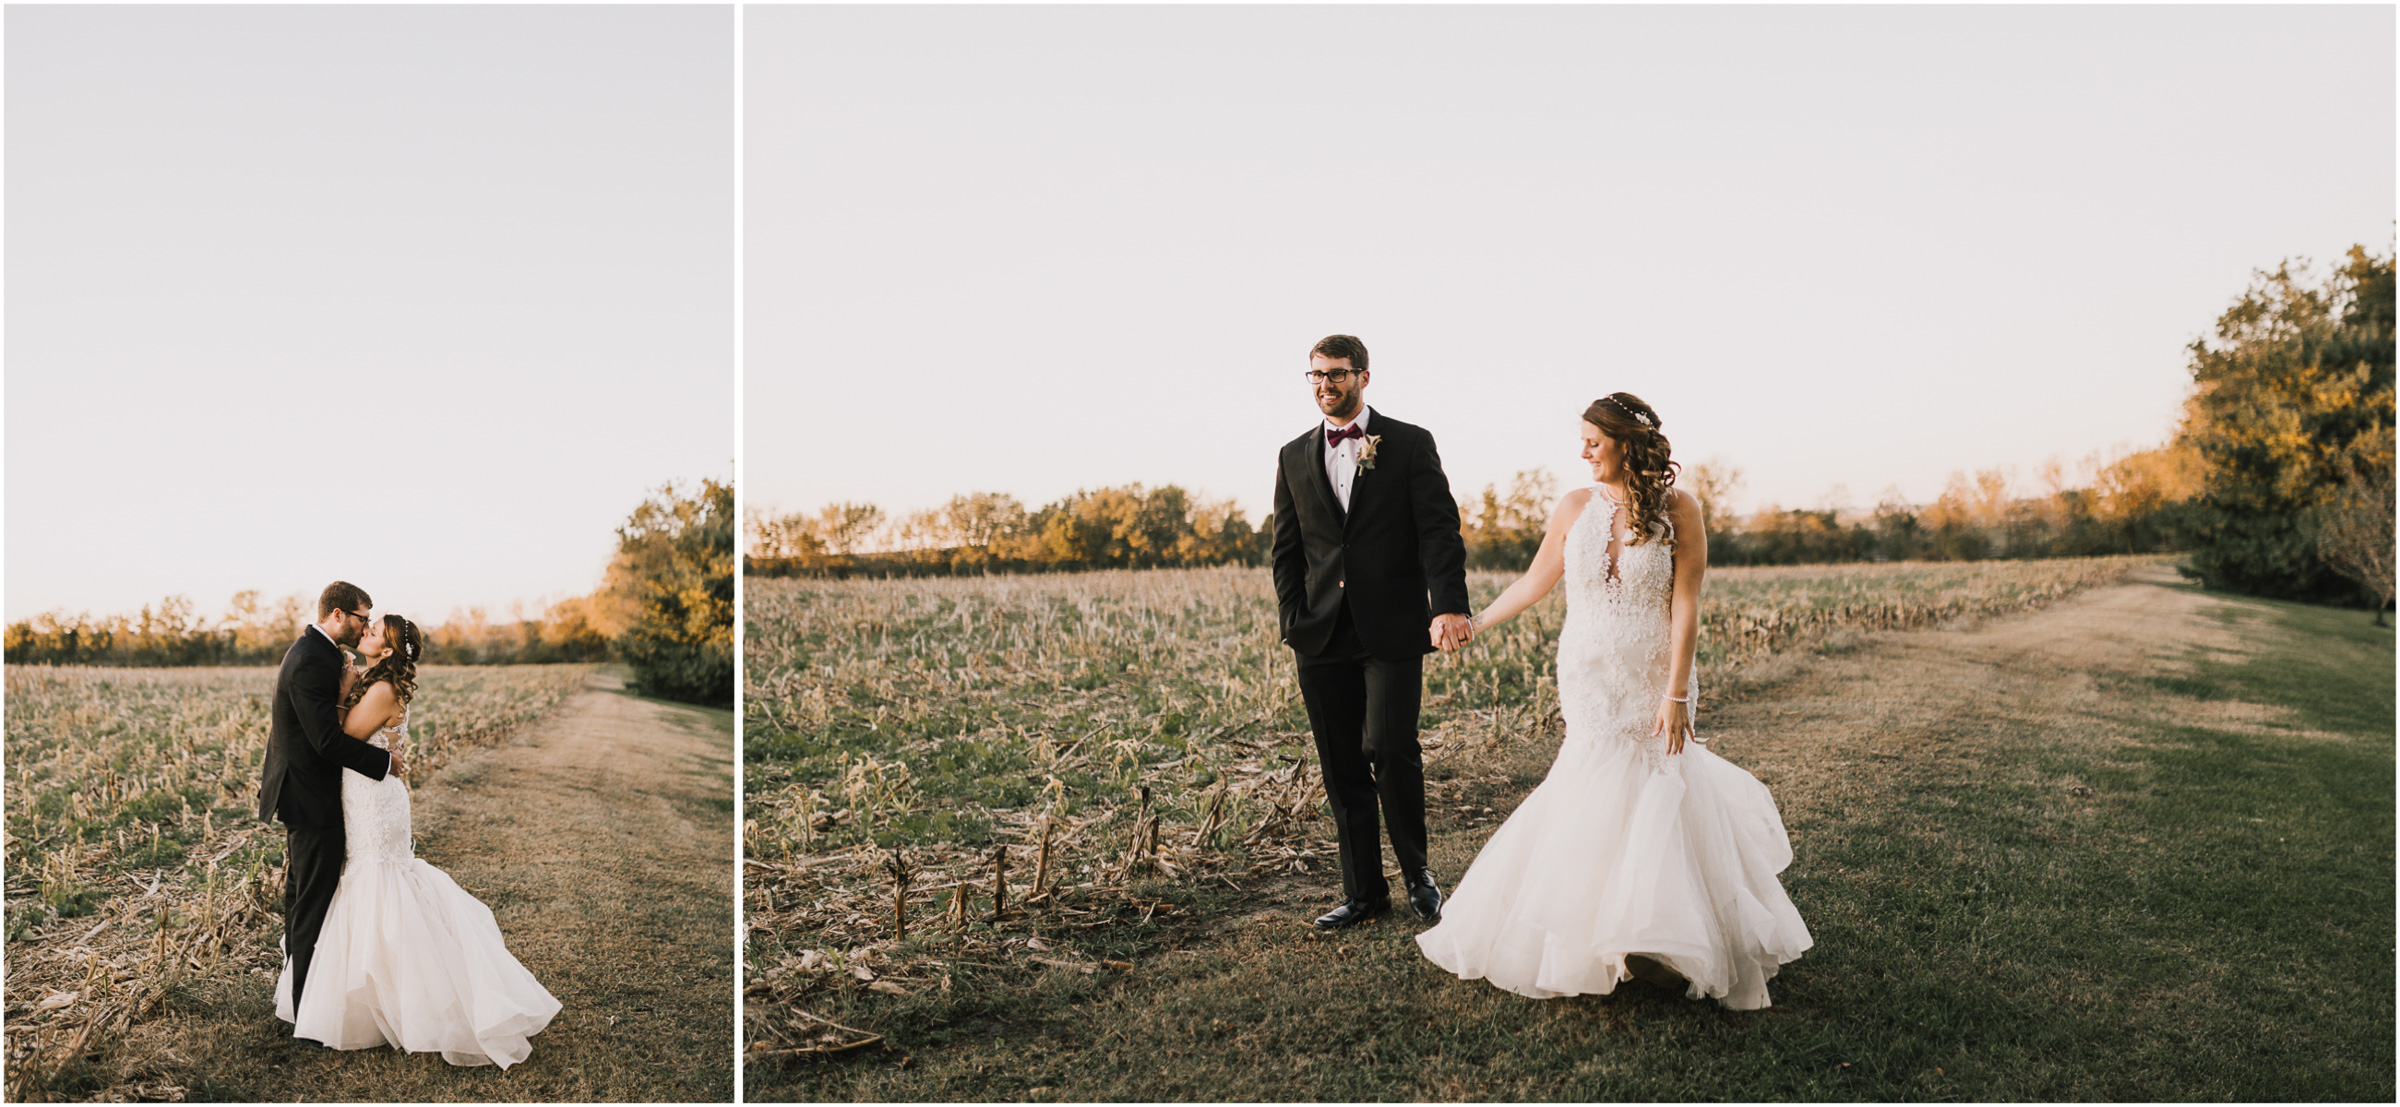 alyssa barletter photography intimate fall autumn wedding rural missouri wedding photographer-38.jpg